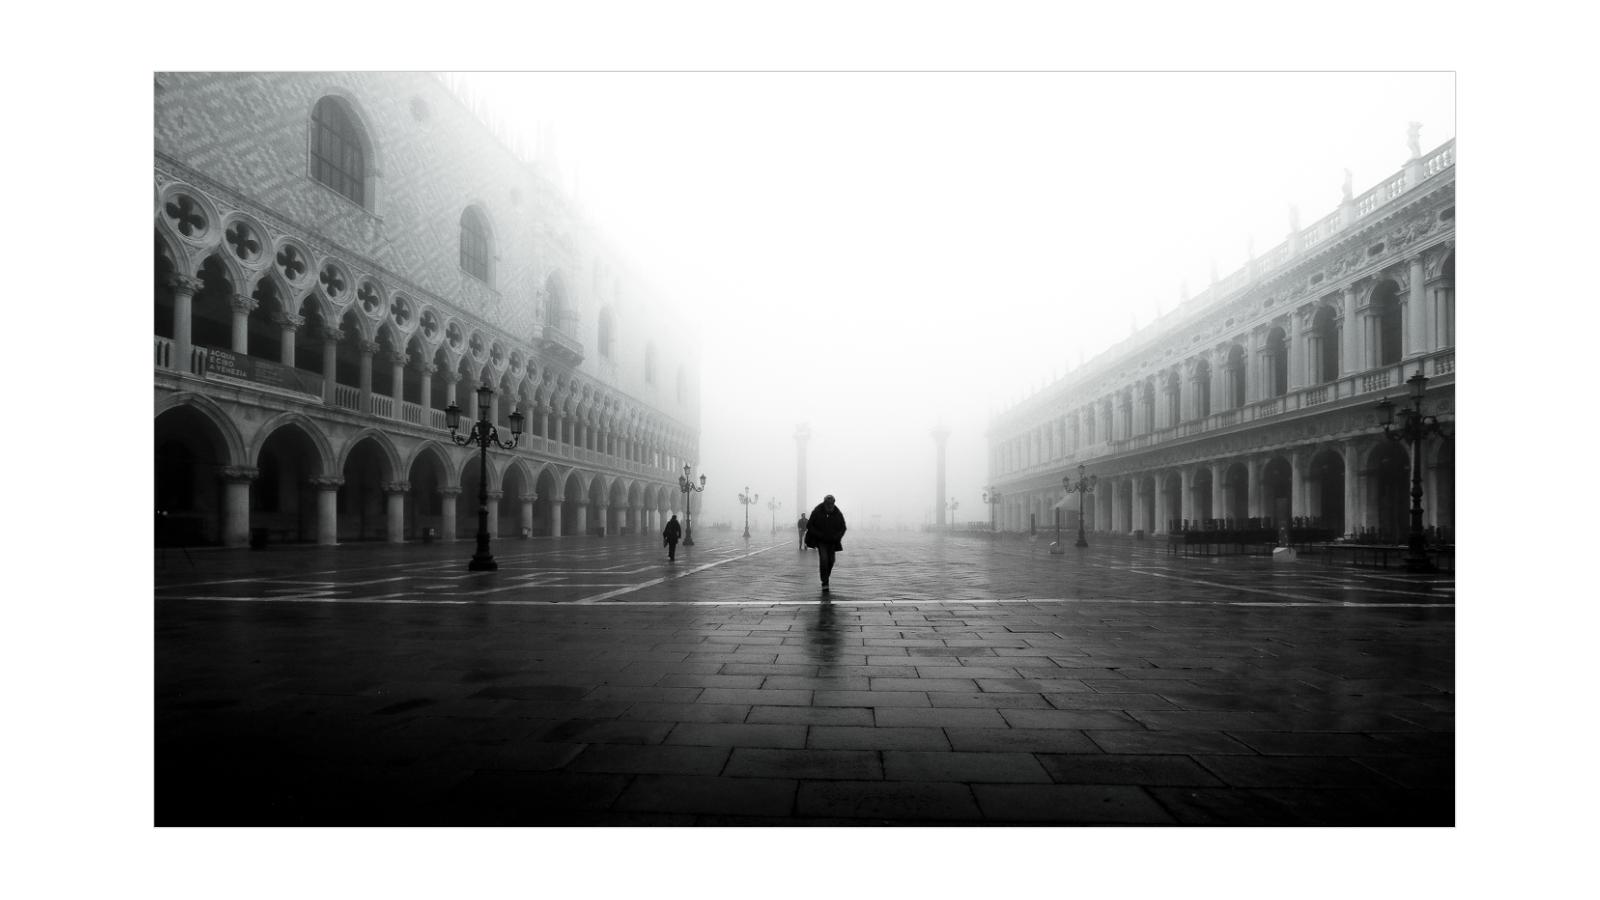 Piazetta San Marco